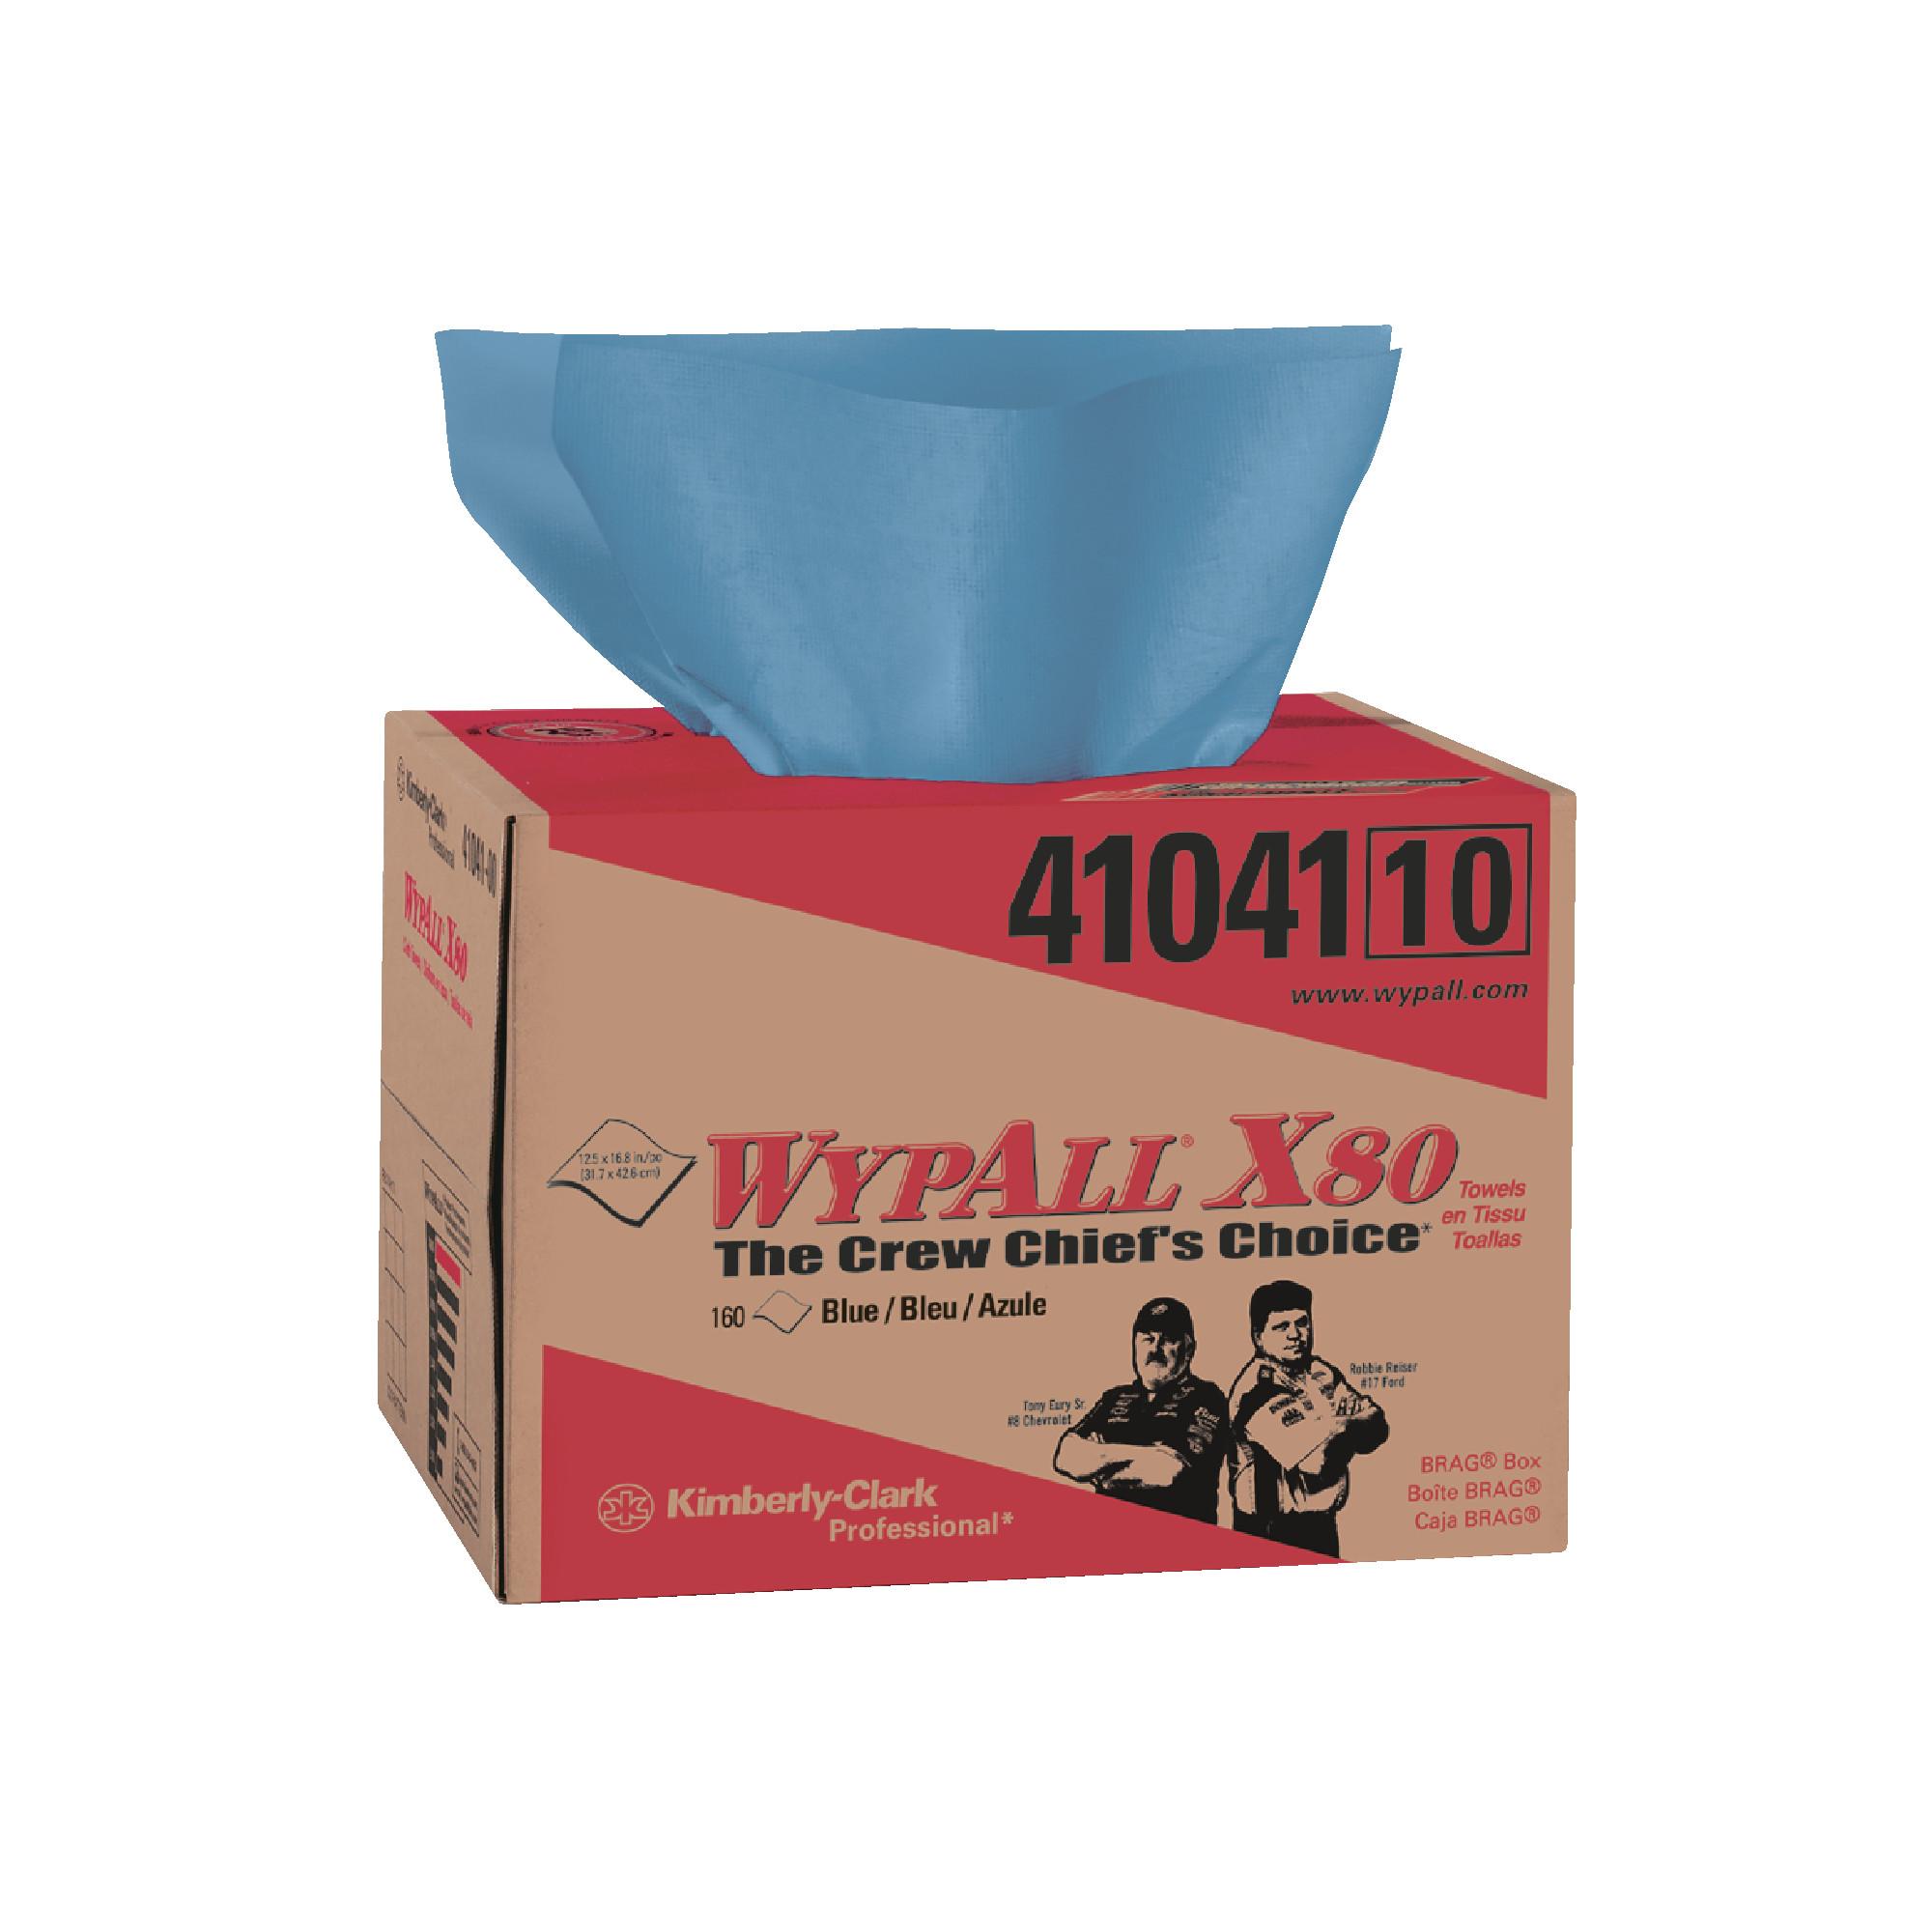 Wypall X80 Towel Brag Box